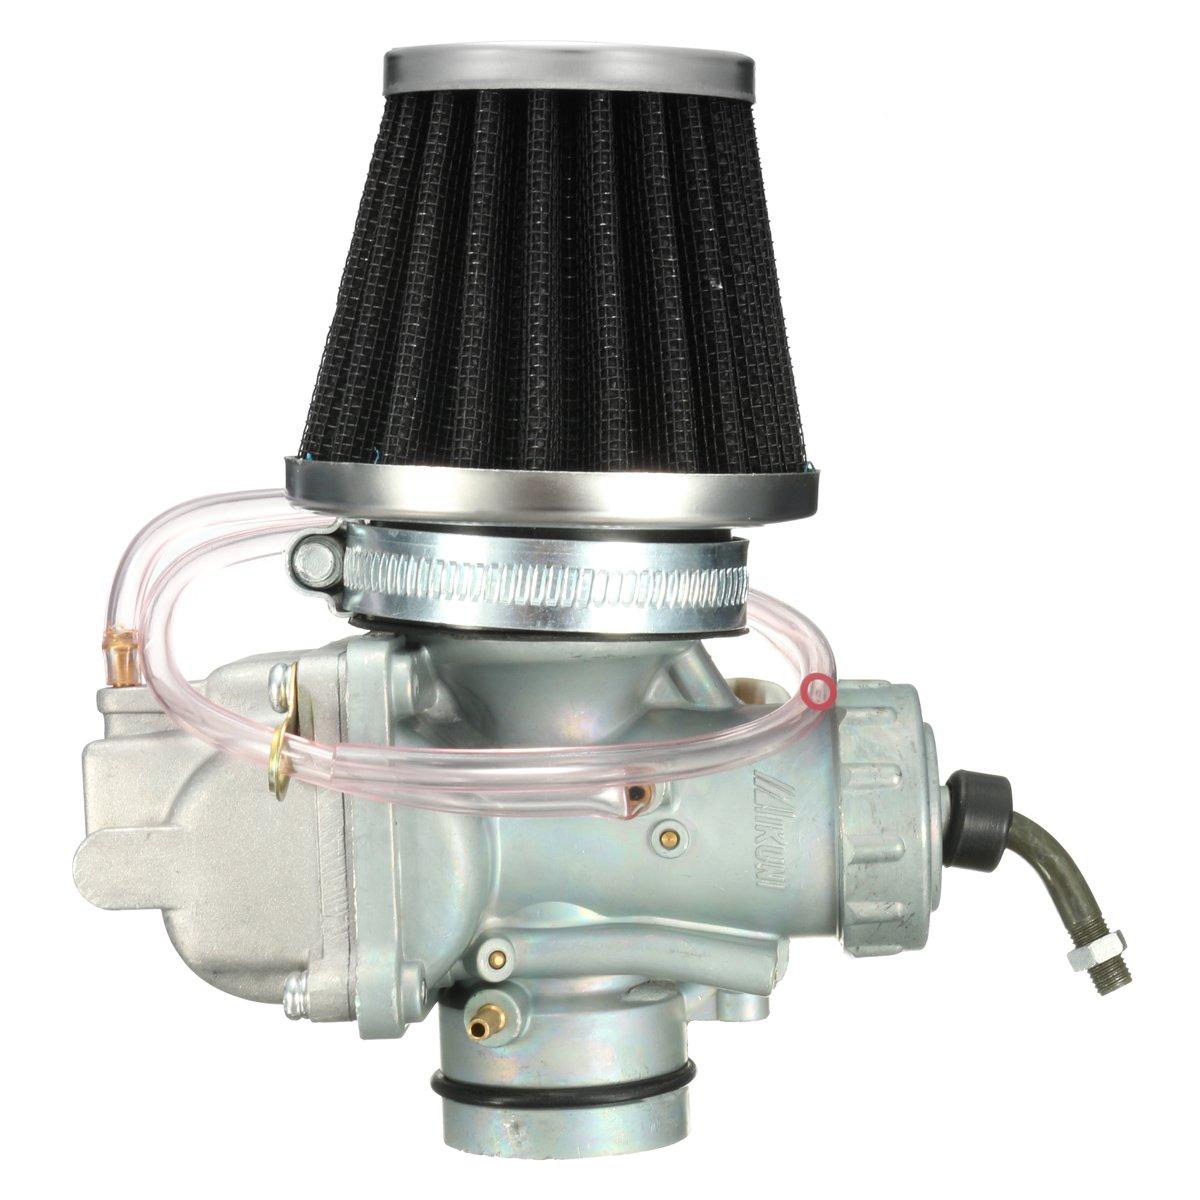 Alamor Carburador Carb Filtro De Aire para Yamaha Ttr125 Tt-R125 00-03